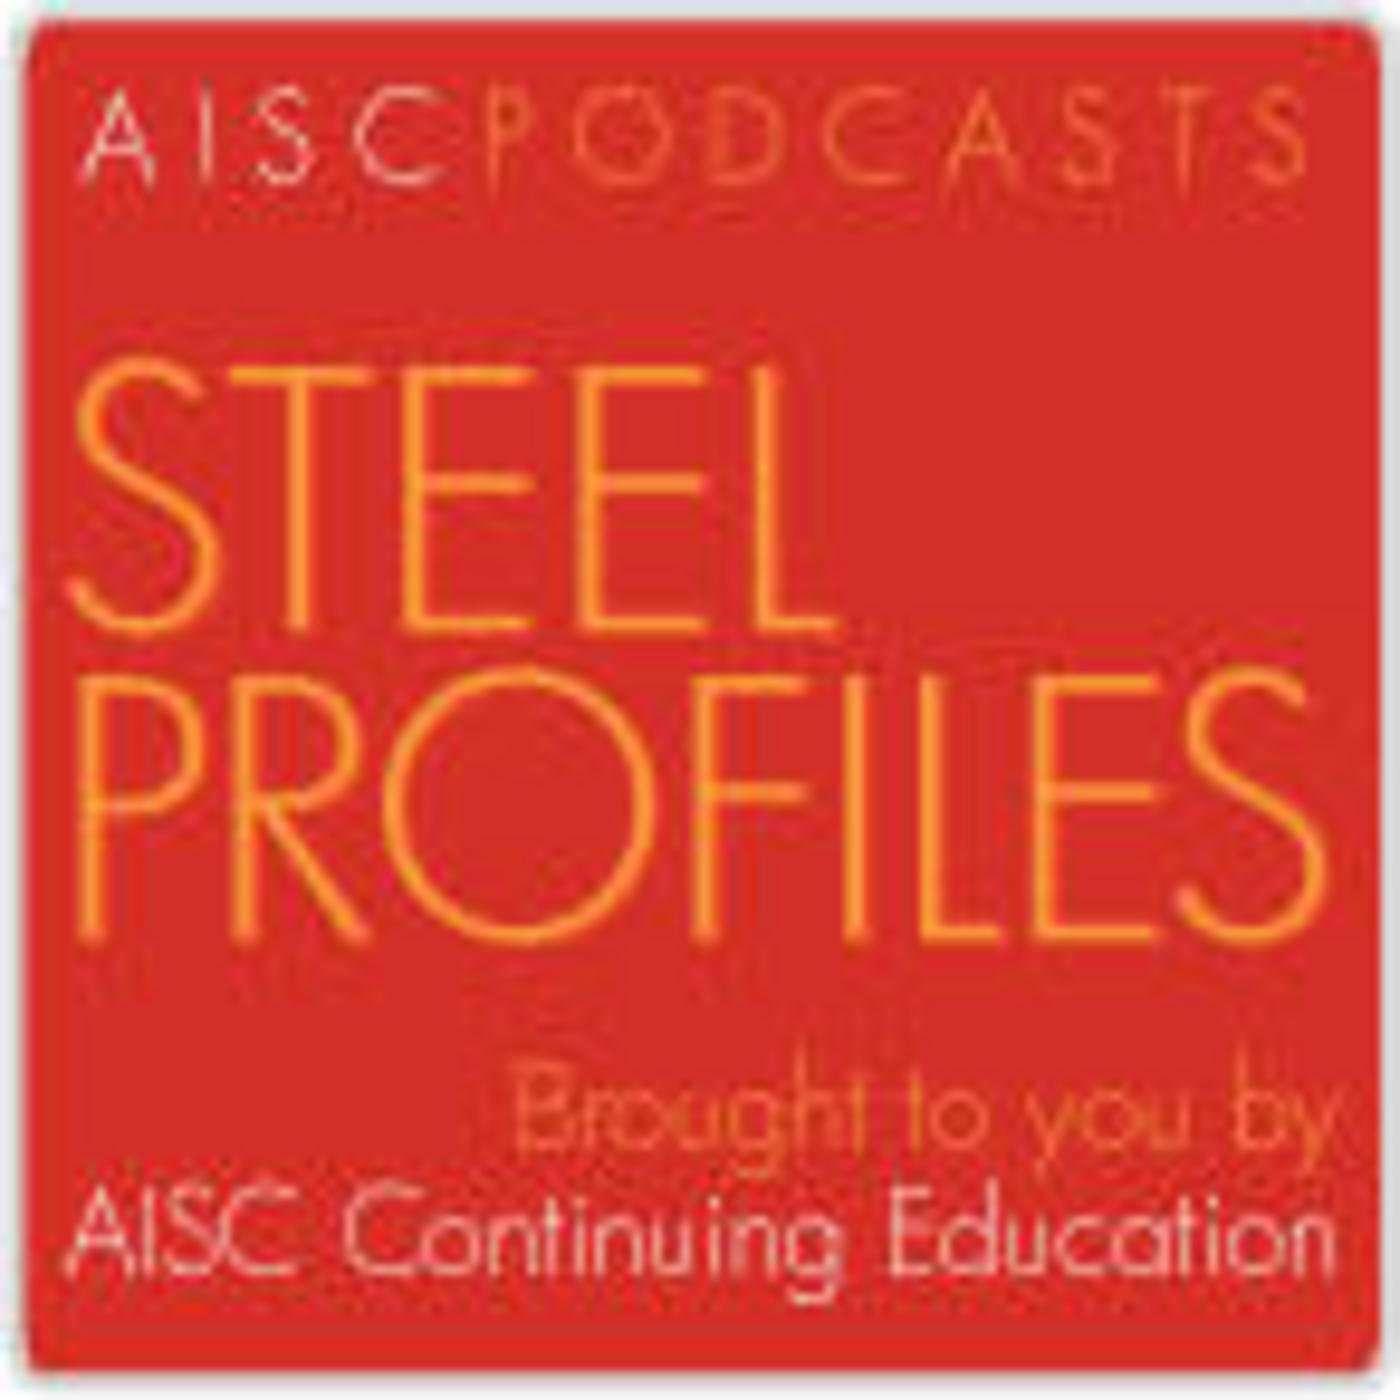 Steel Profiles - Episode #26